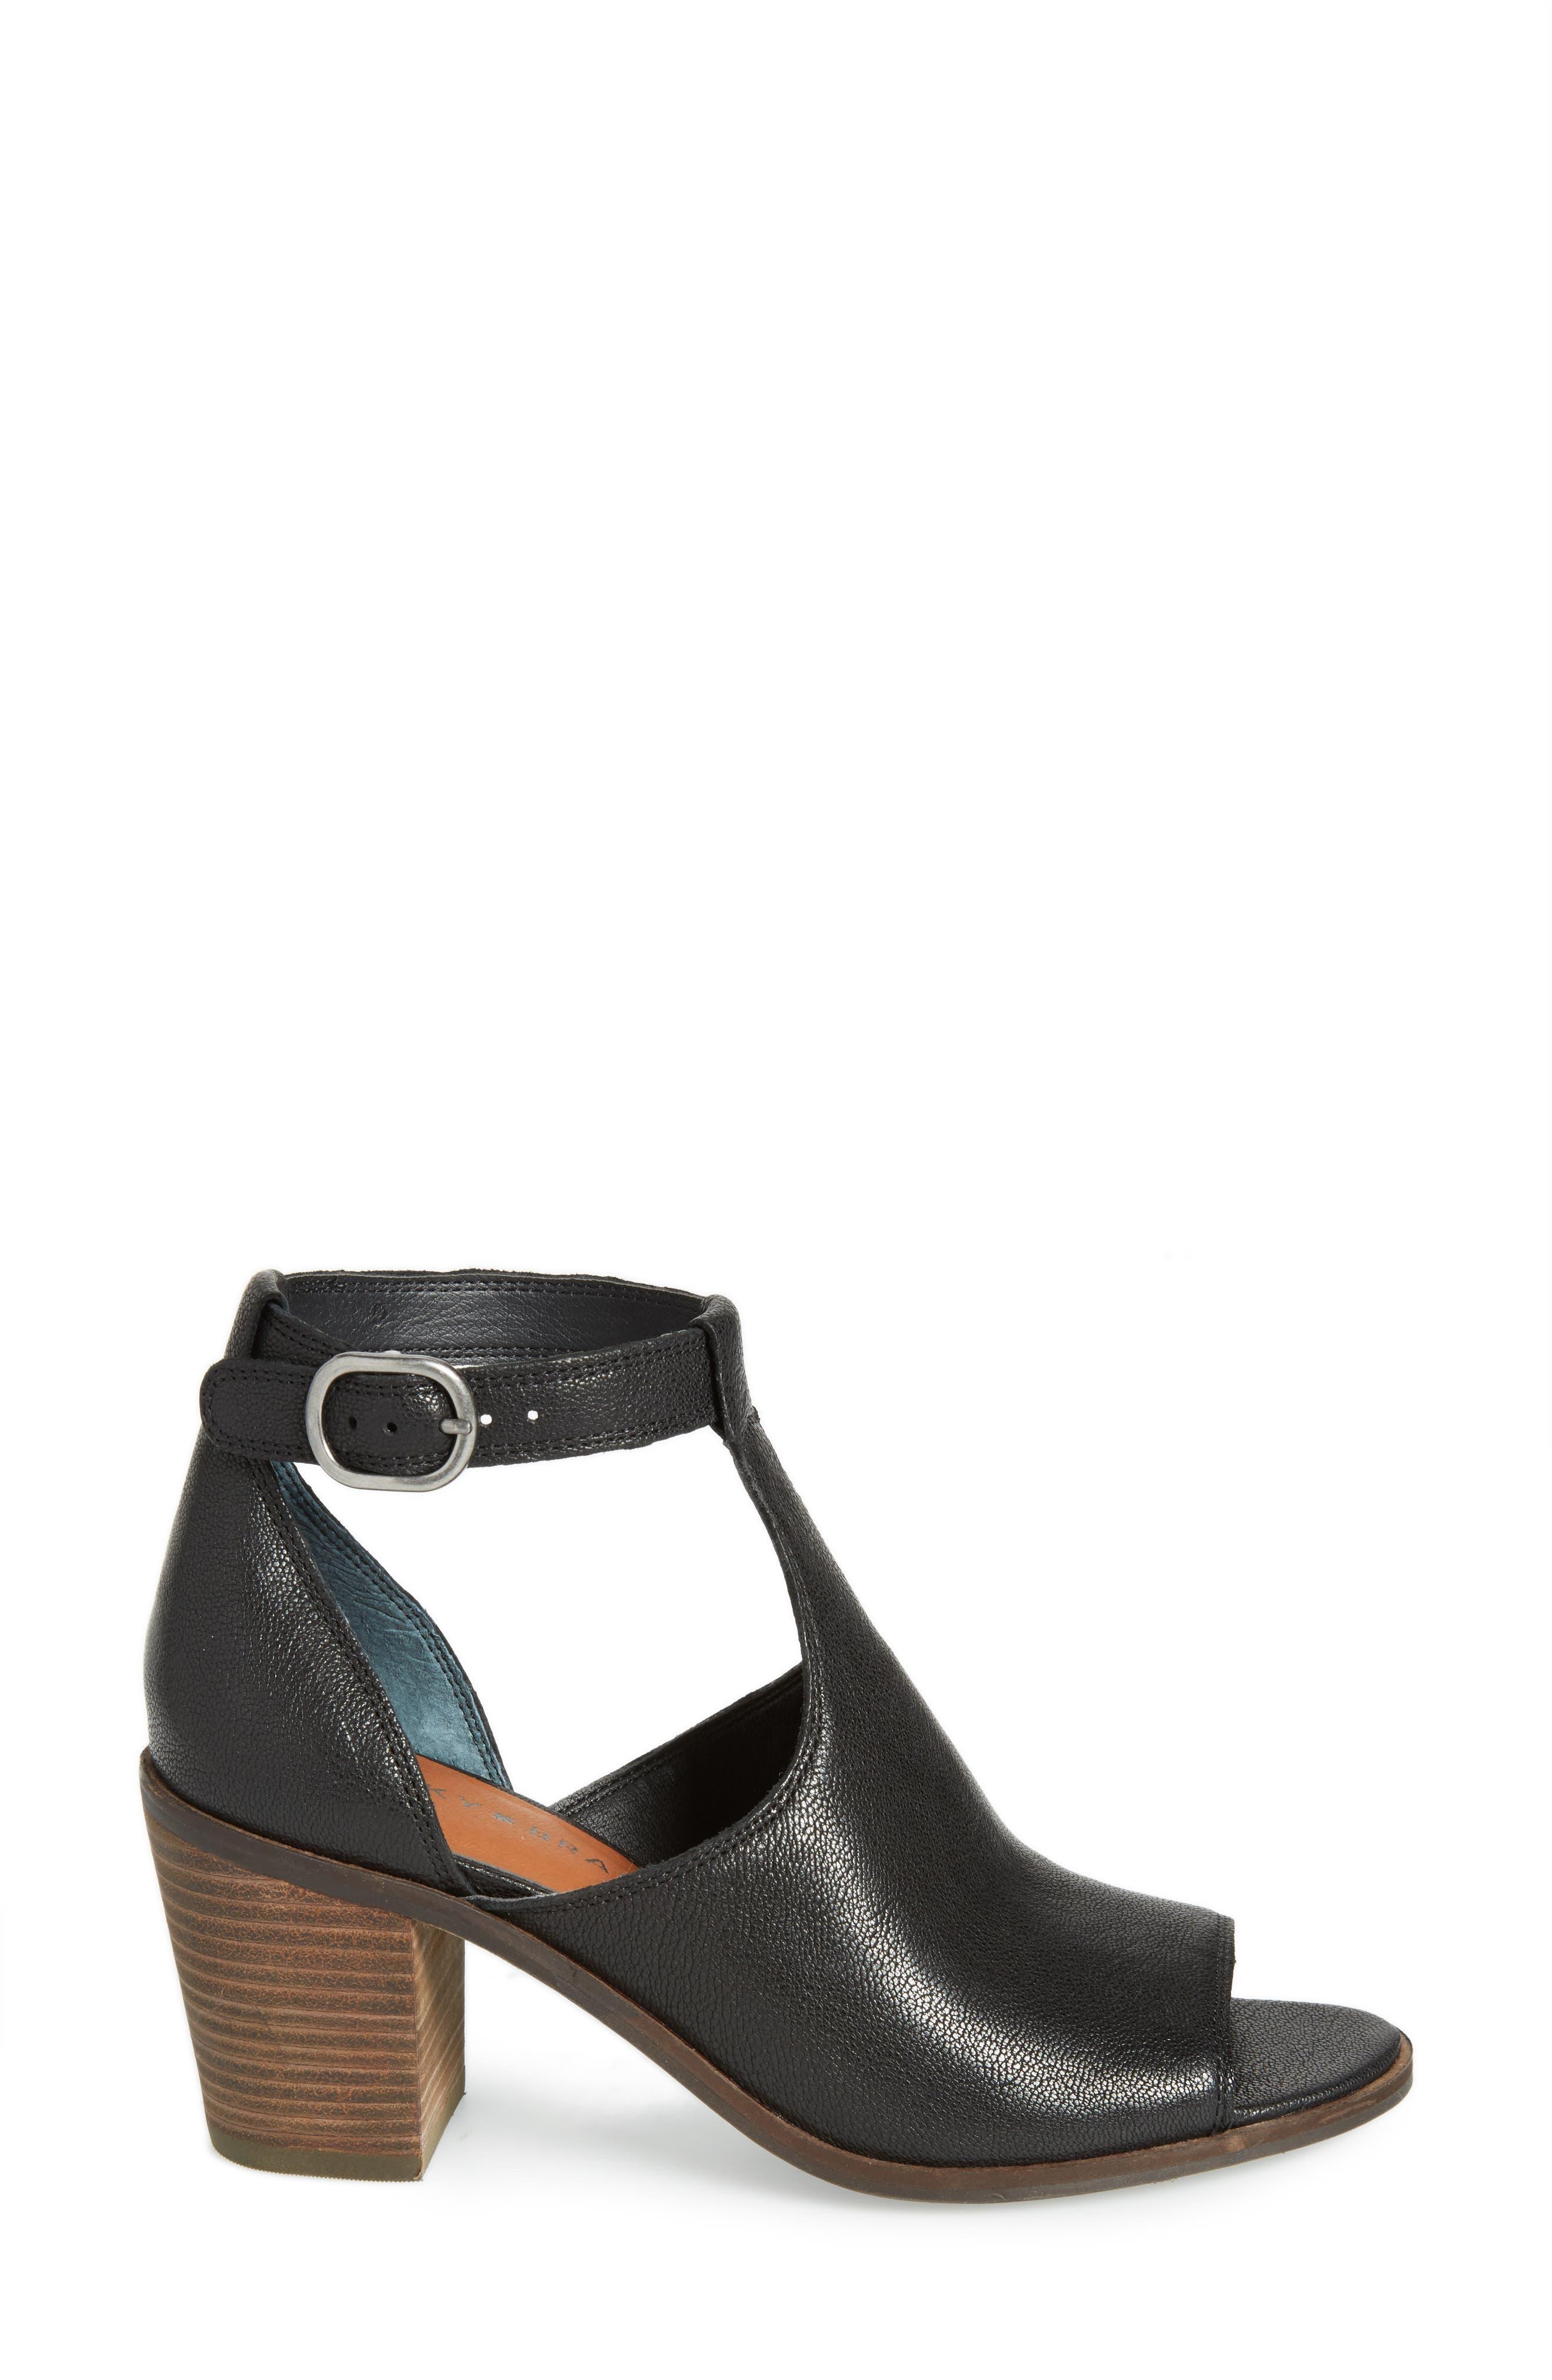 Kadian Block Heel Sandal,                             Alternate thumbnail 5, color,